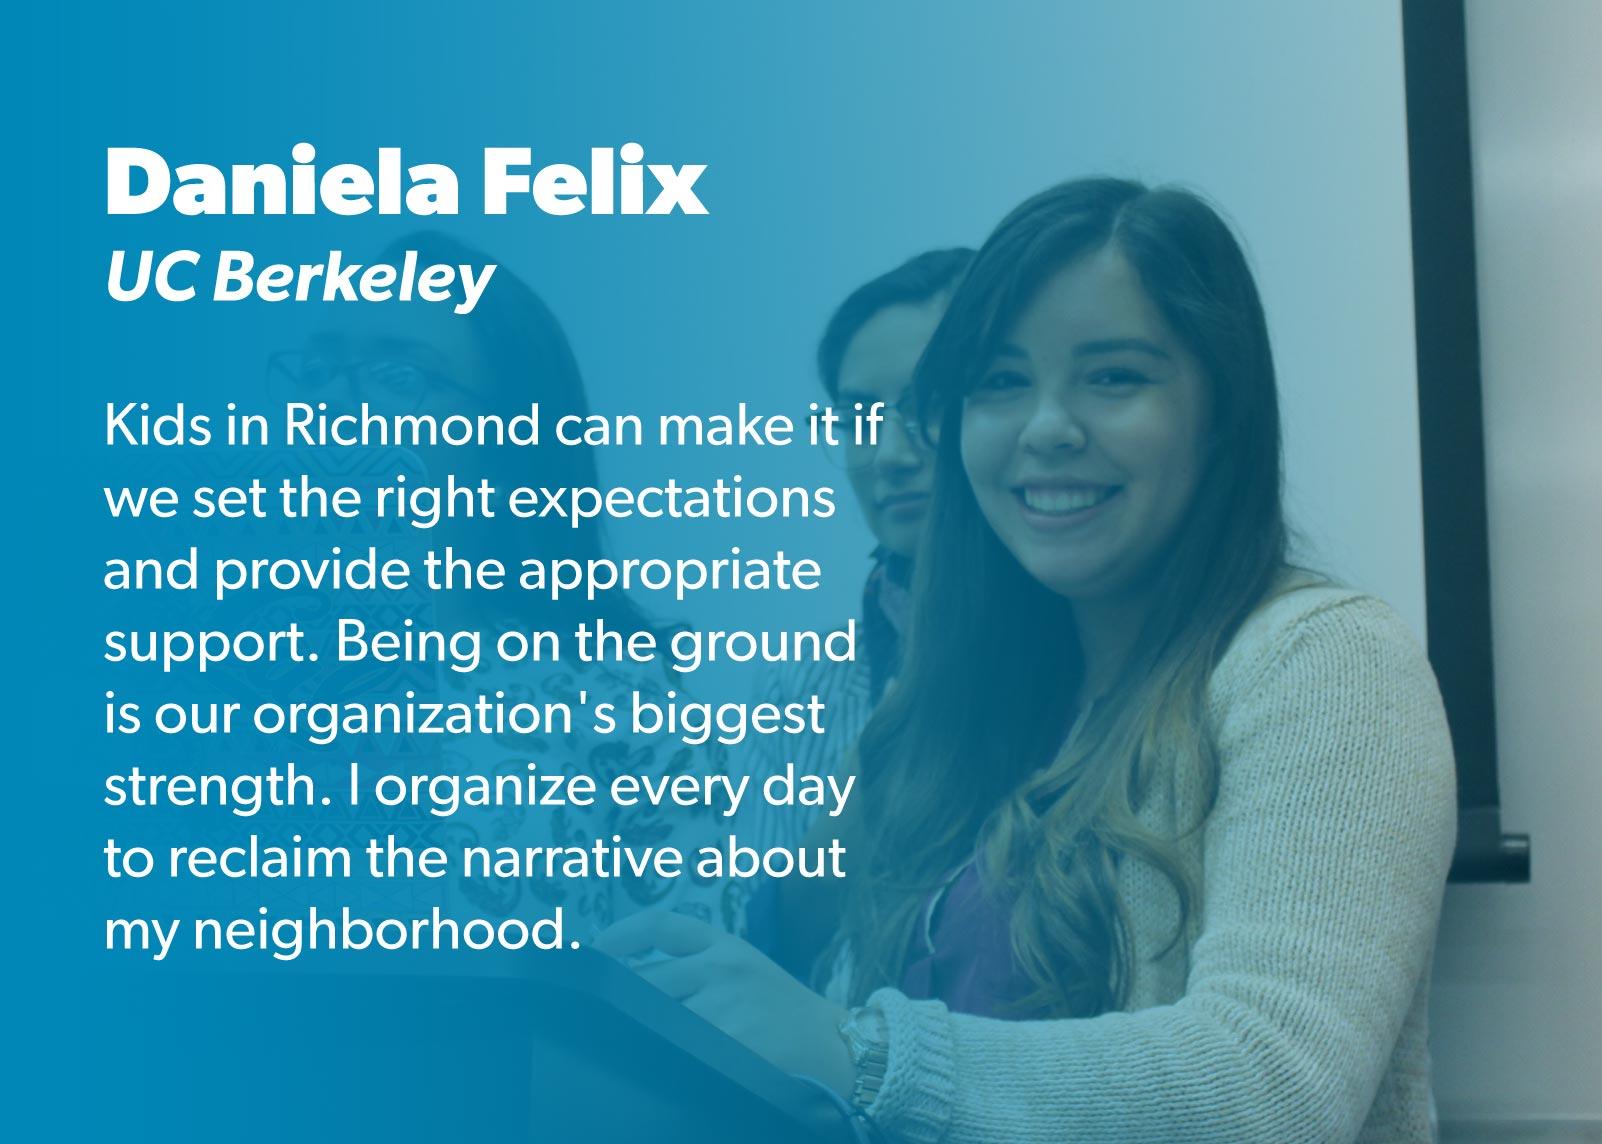 Daniela_Felix_UC_Berkeley.jpg